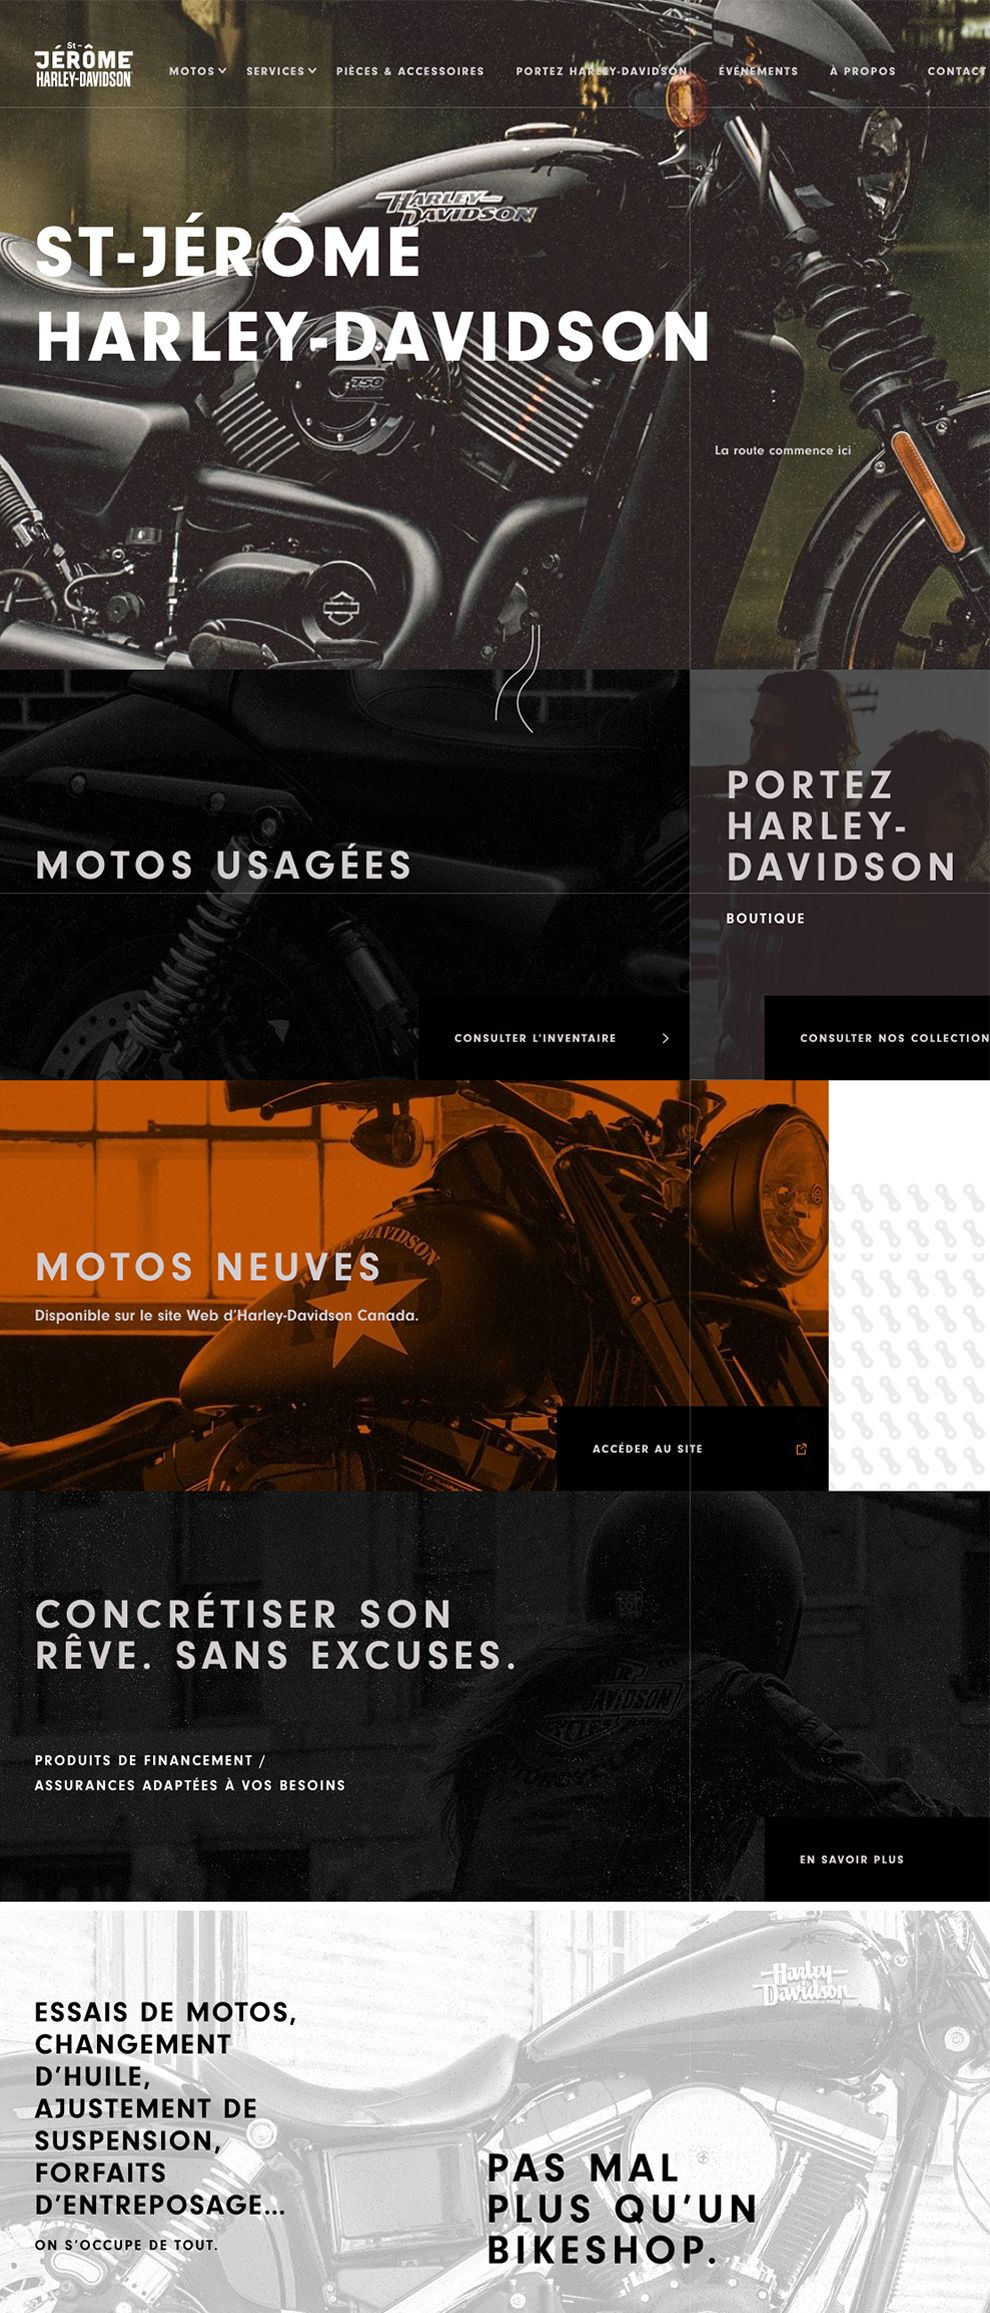 St. Jerome Harley Davidson Gorgeous Homepage